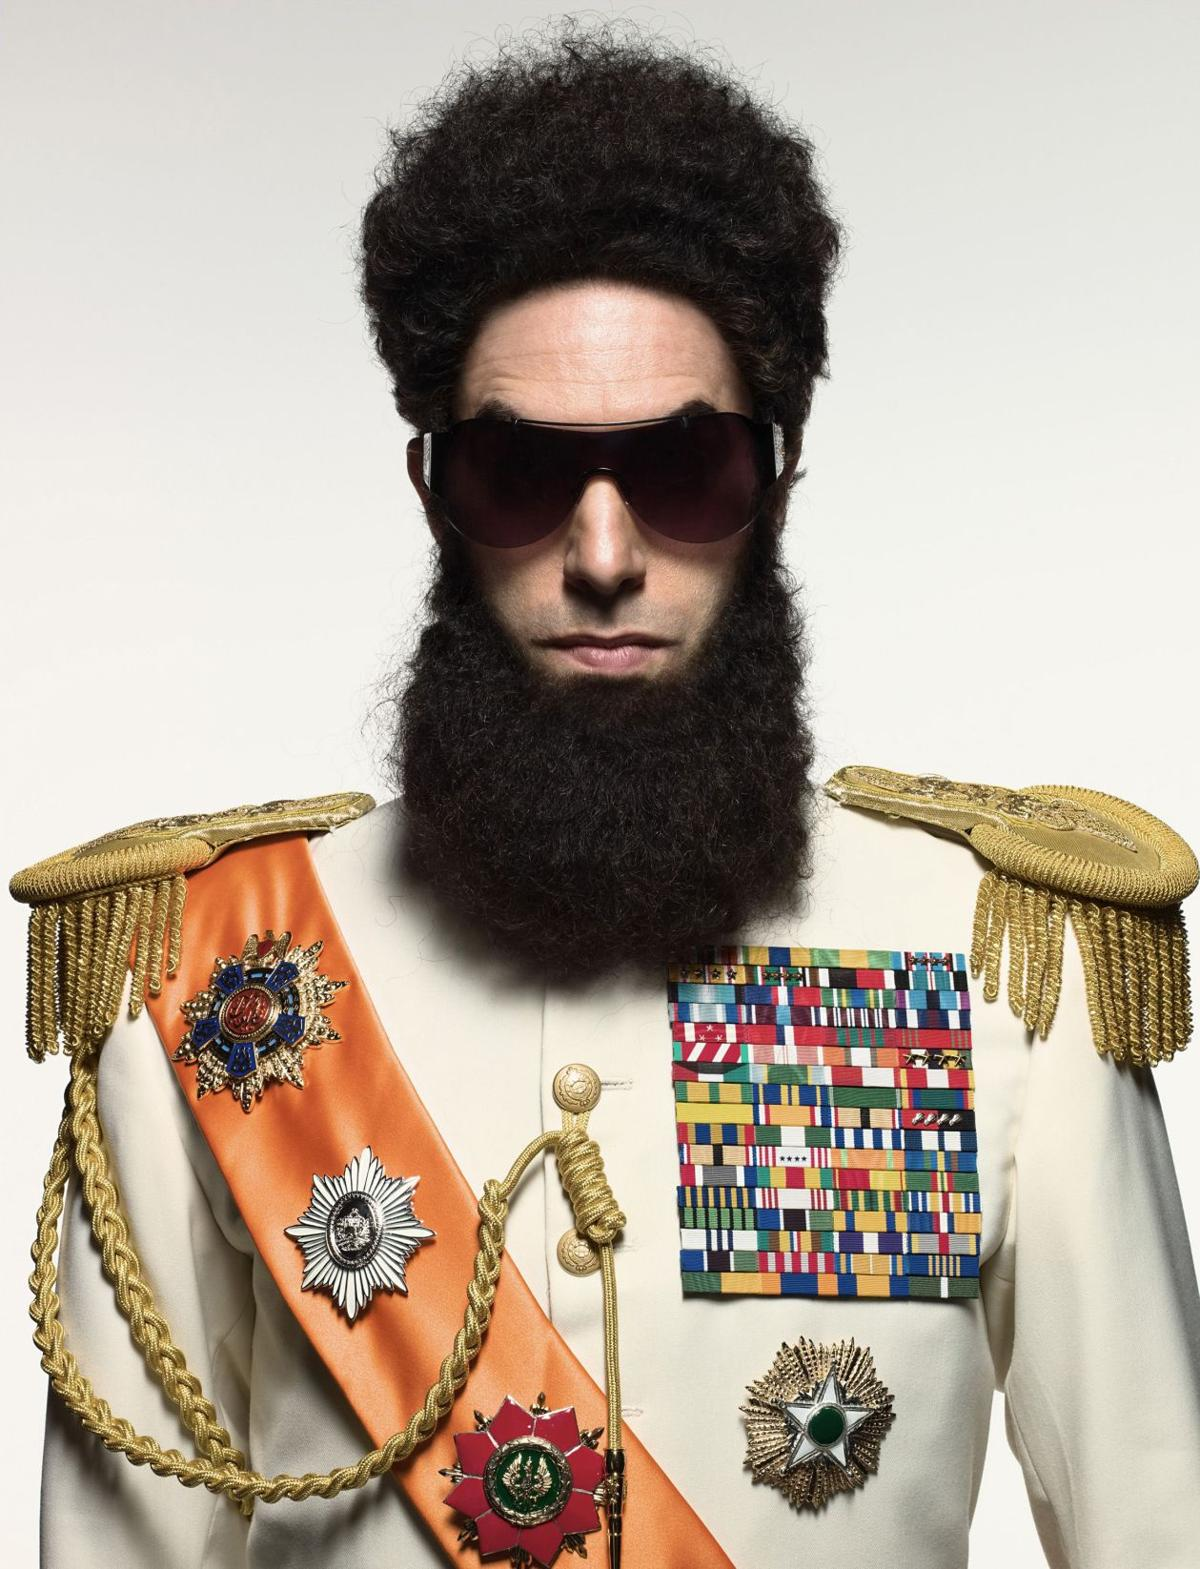 Baron Cohen's 'Dictator' unfocused spoof